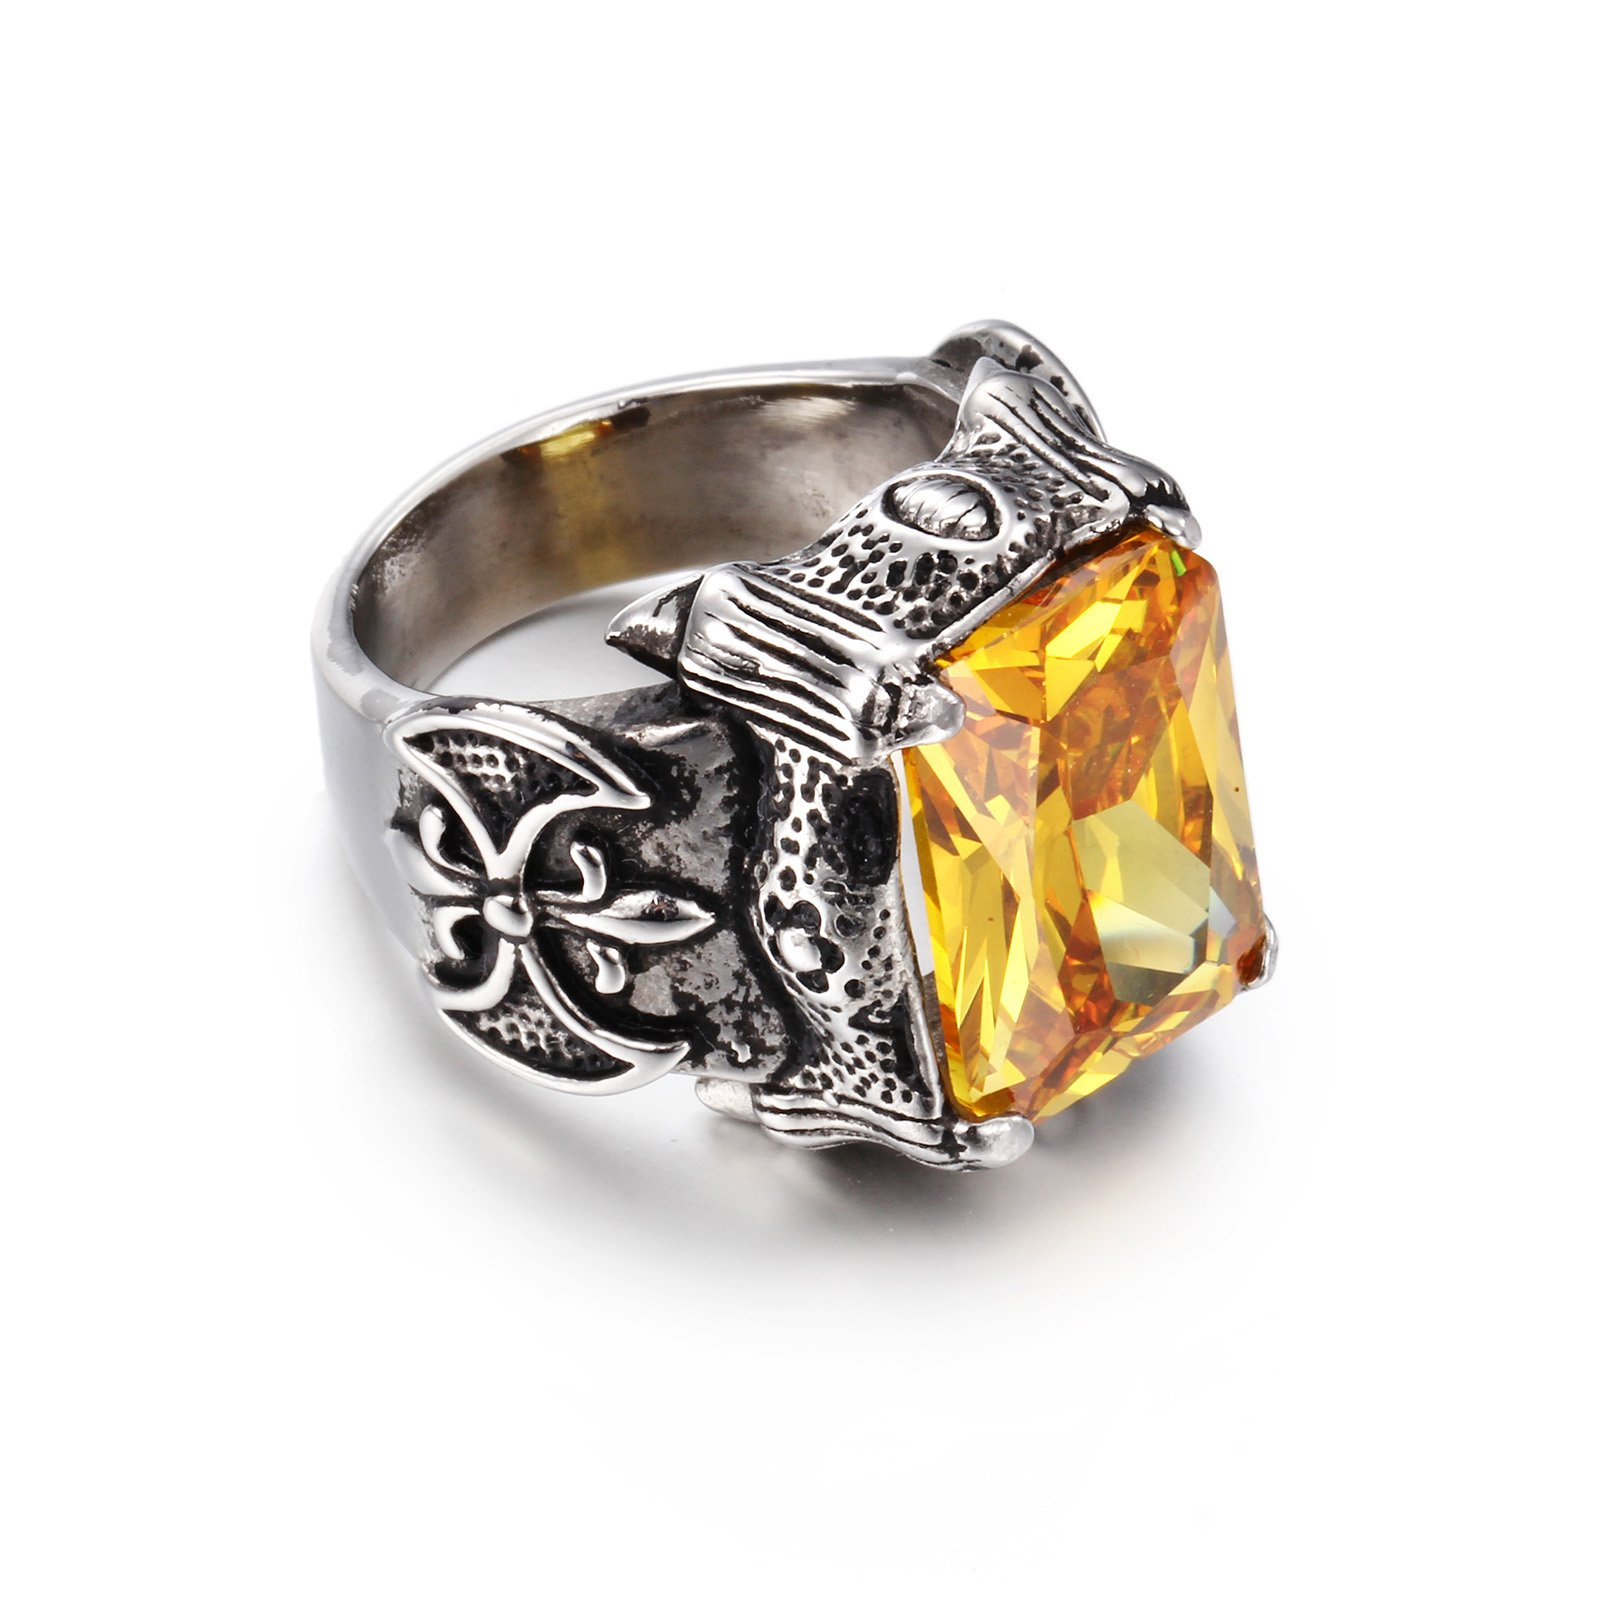 NELSON KENT Men's Retro Inlaid Yellow Zircon Titanium Steel Silver Ring Size 9